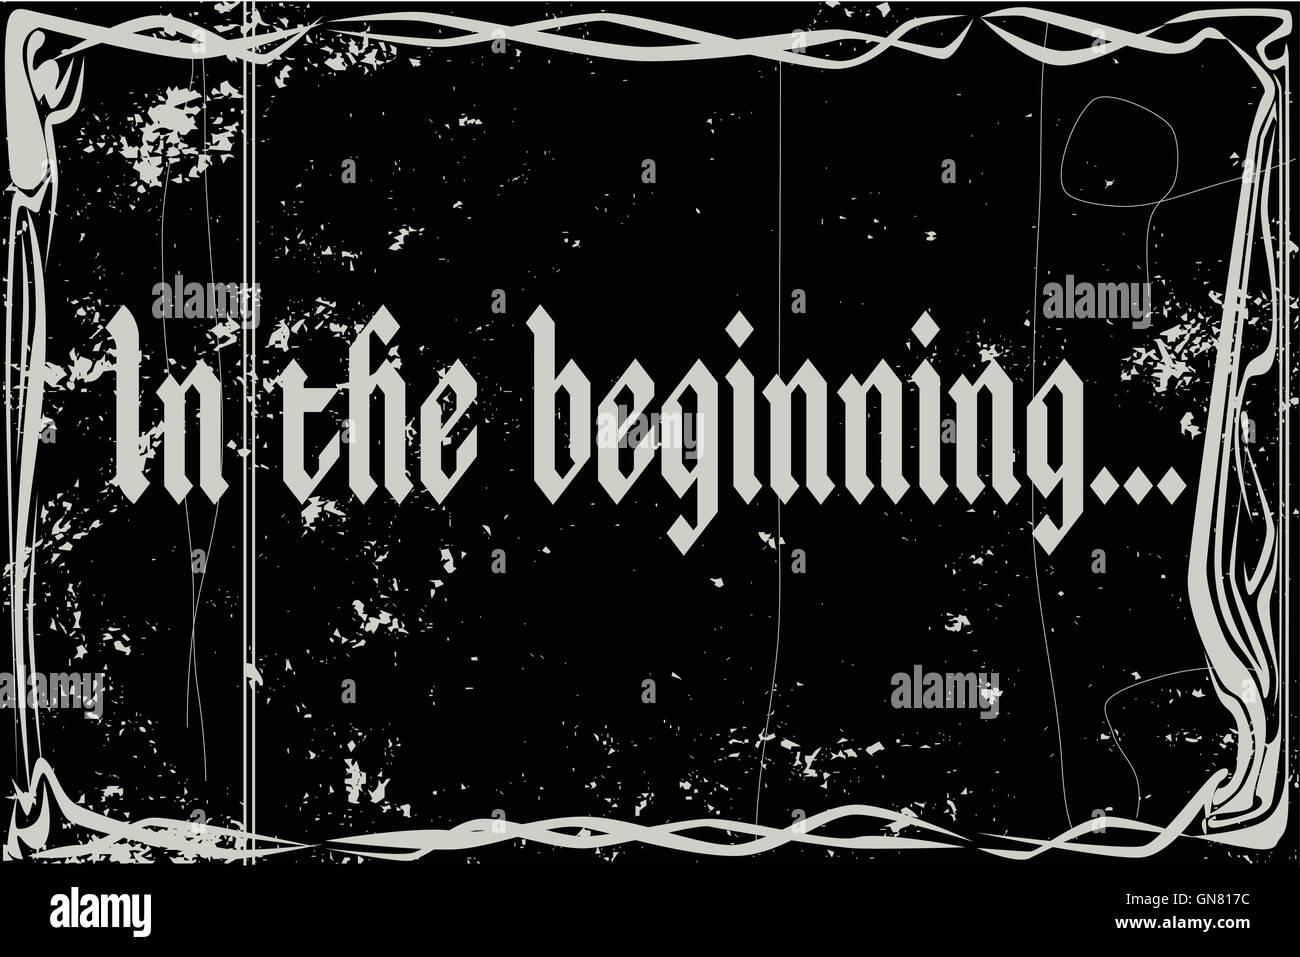 Stummfilm-Rahmen am Anfang Vektor Abbildung - Bild: 116346592 - Alamy